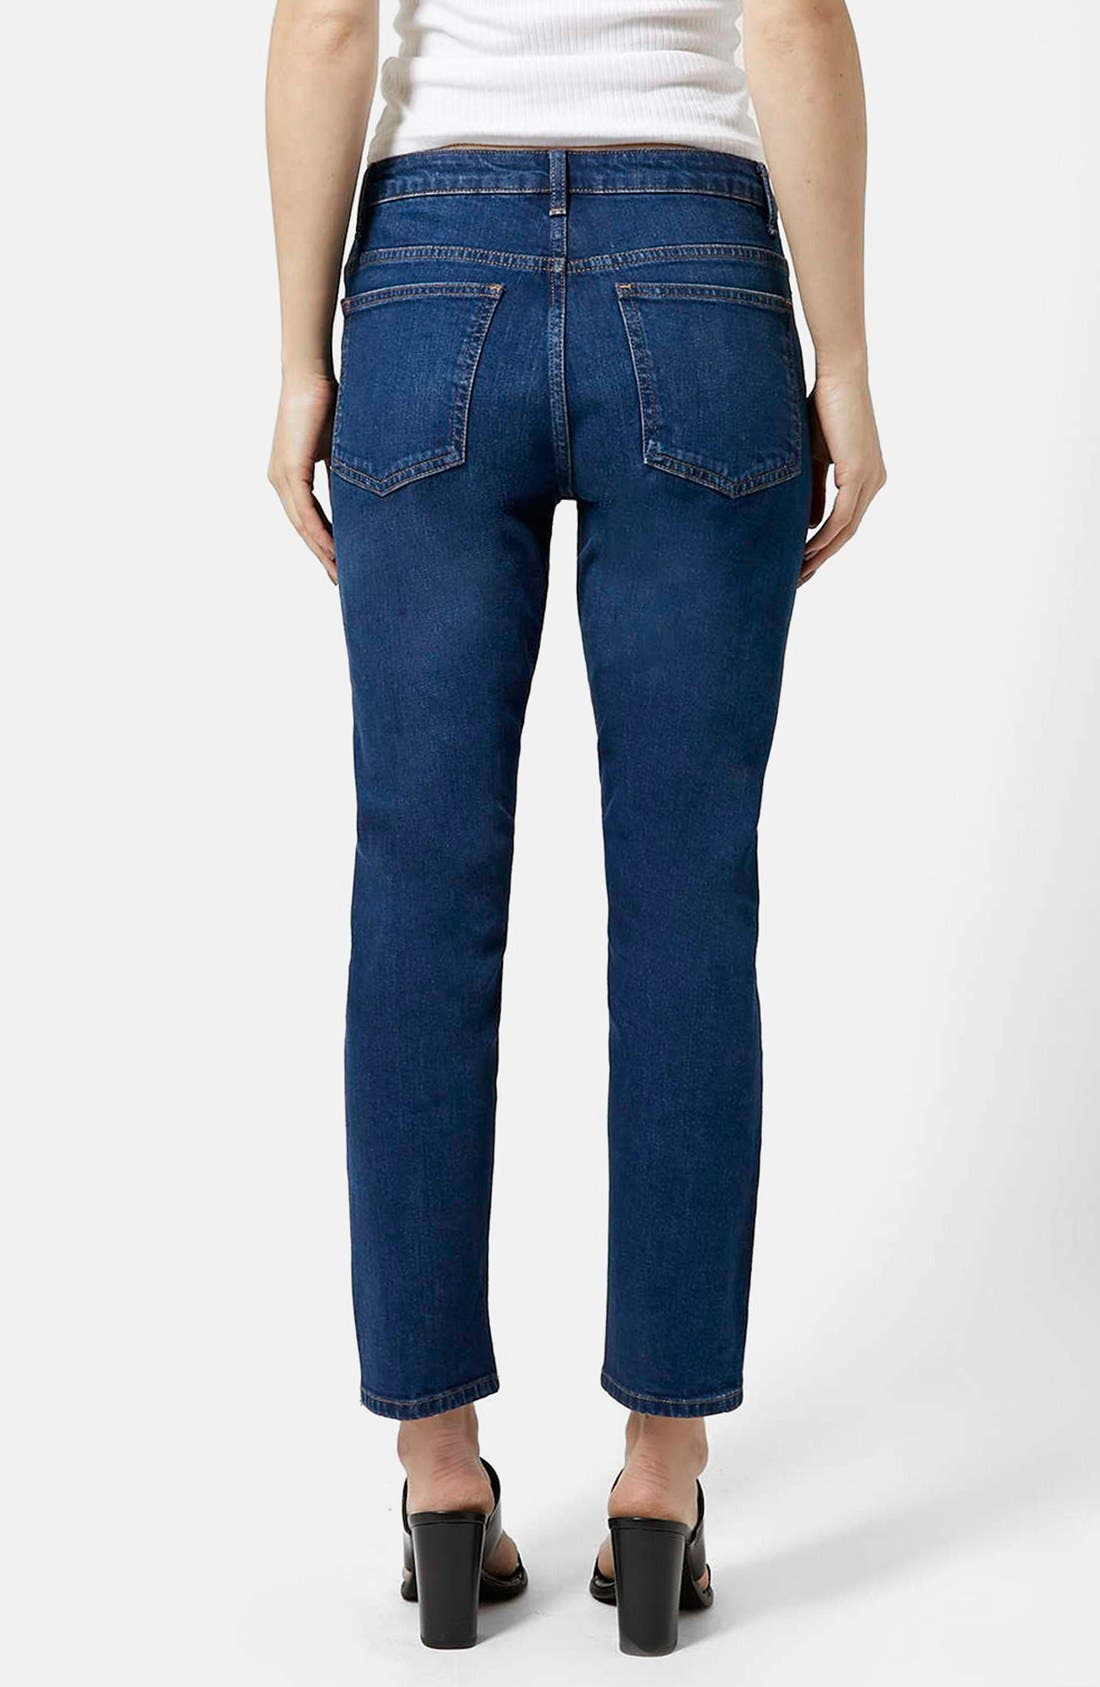 Alternate Image 2  - Topshop Moto Indigo Girlfriend Jeans (Navy Blue)